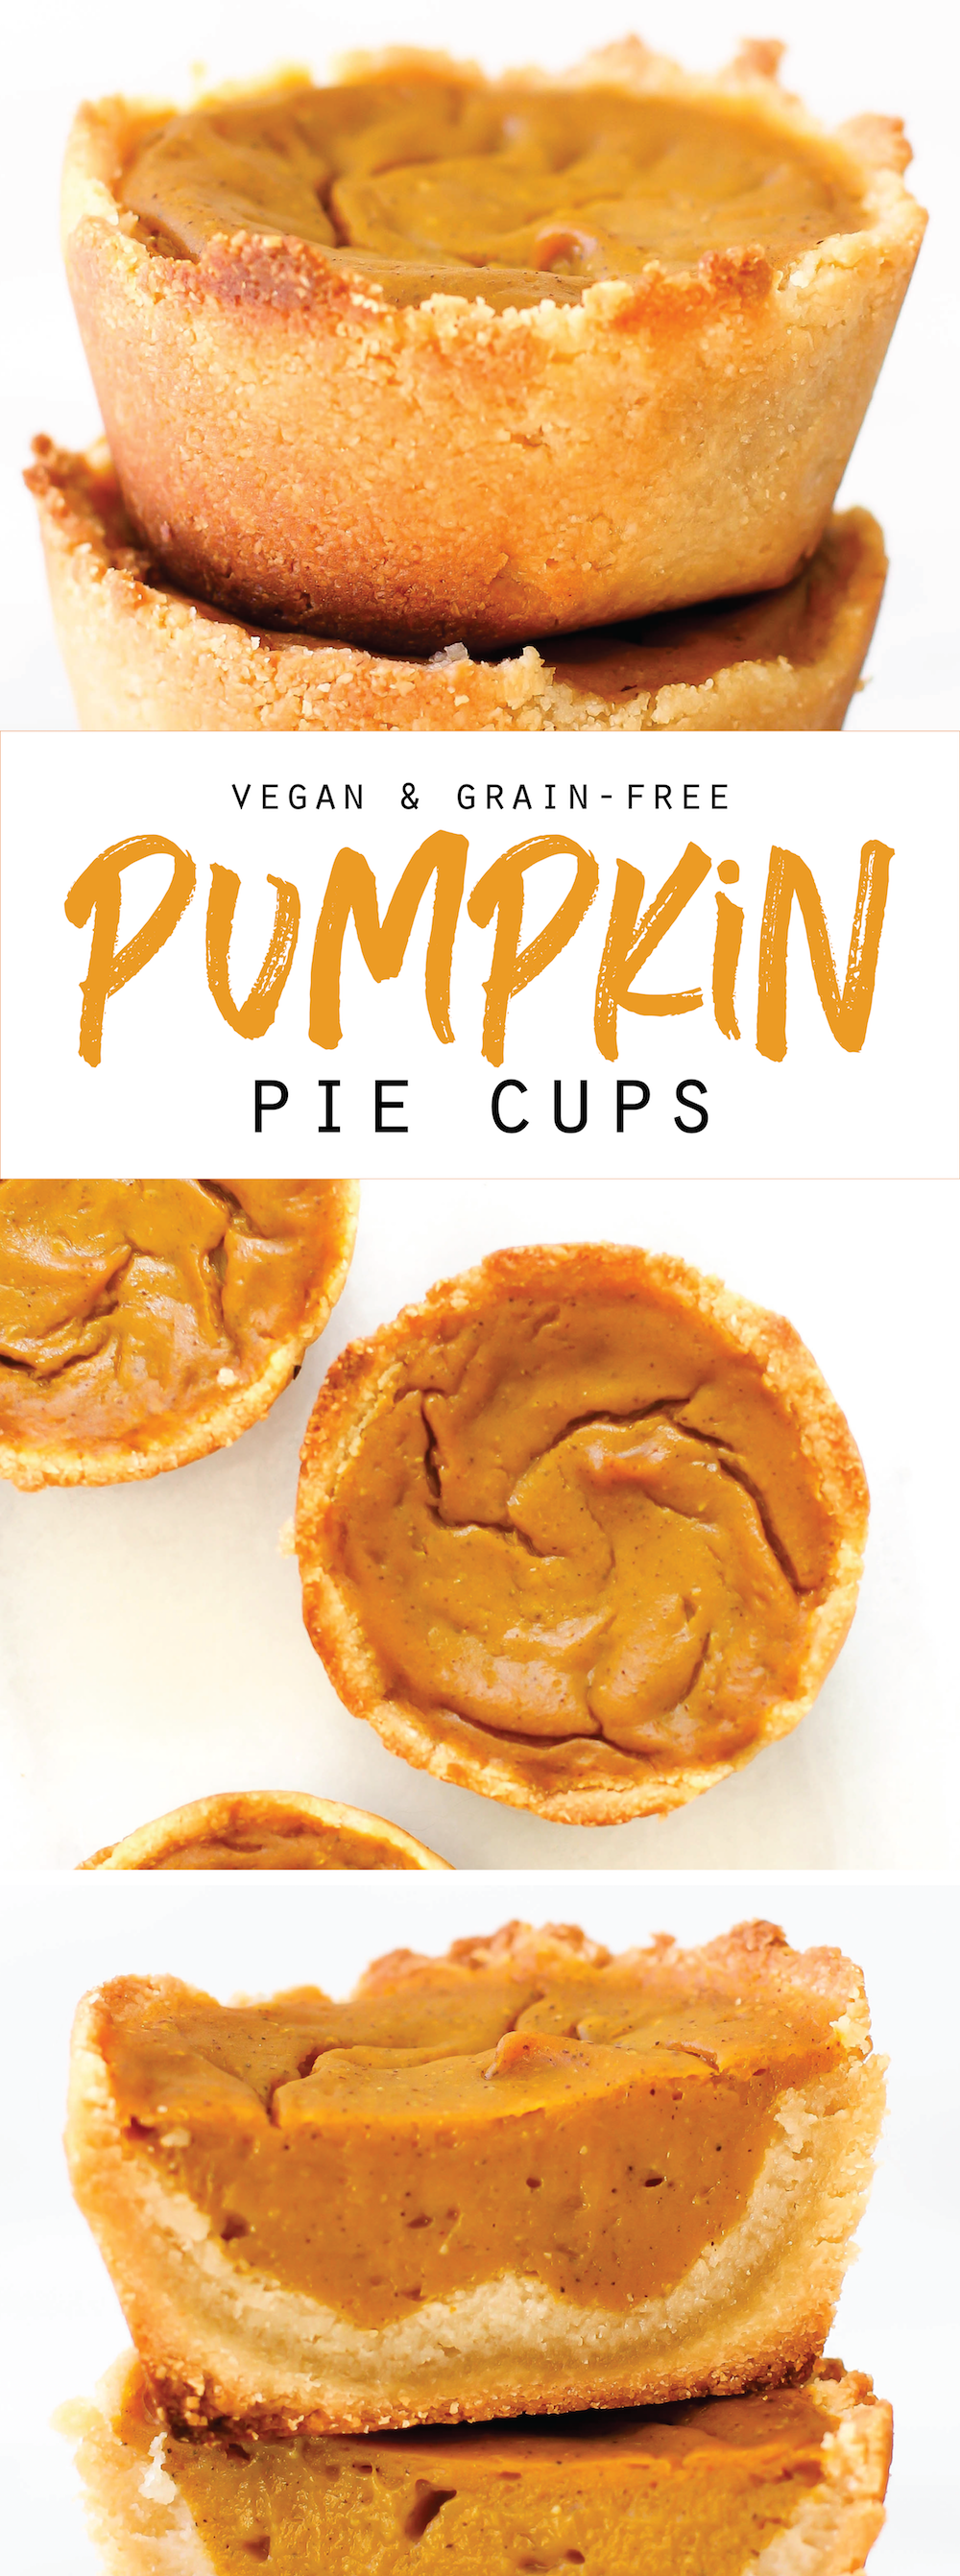 Vegan & GrainFree Pumpkin Pie Cups is part of Vegan dessert Easy - These easy healthy Vegan & GrainFree Pumpkin Pie Cups are just like your favorite fall or Thanksgiving dessert but in a smaller, 6 ingredient form!